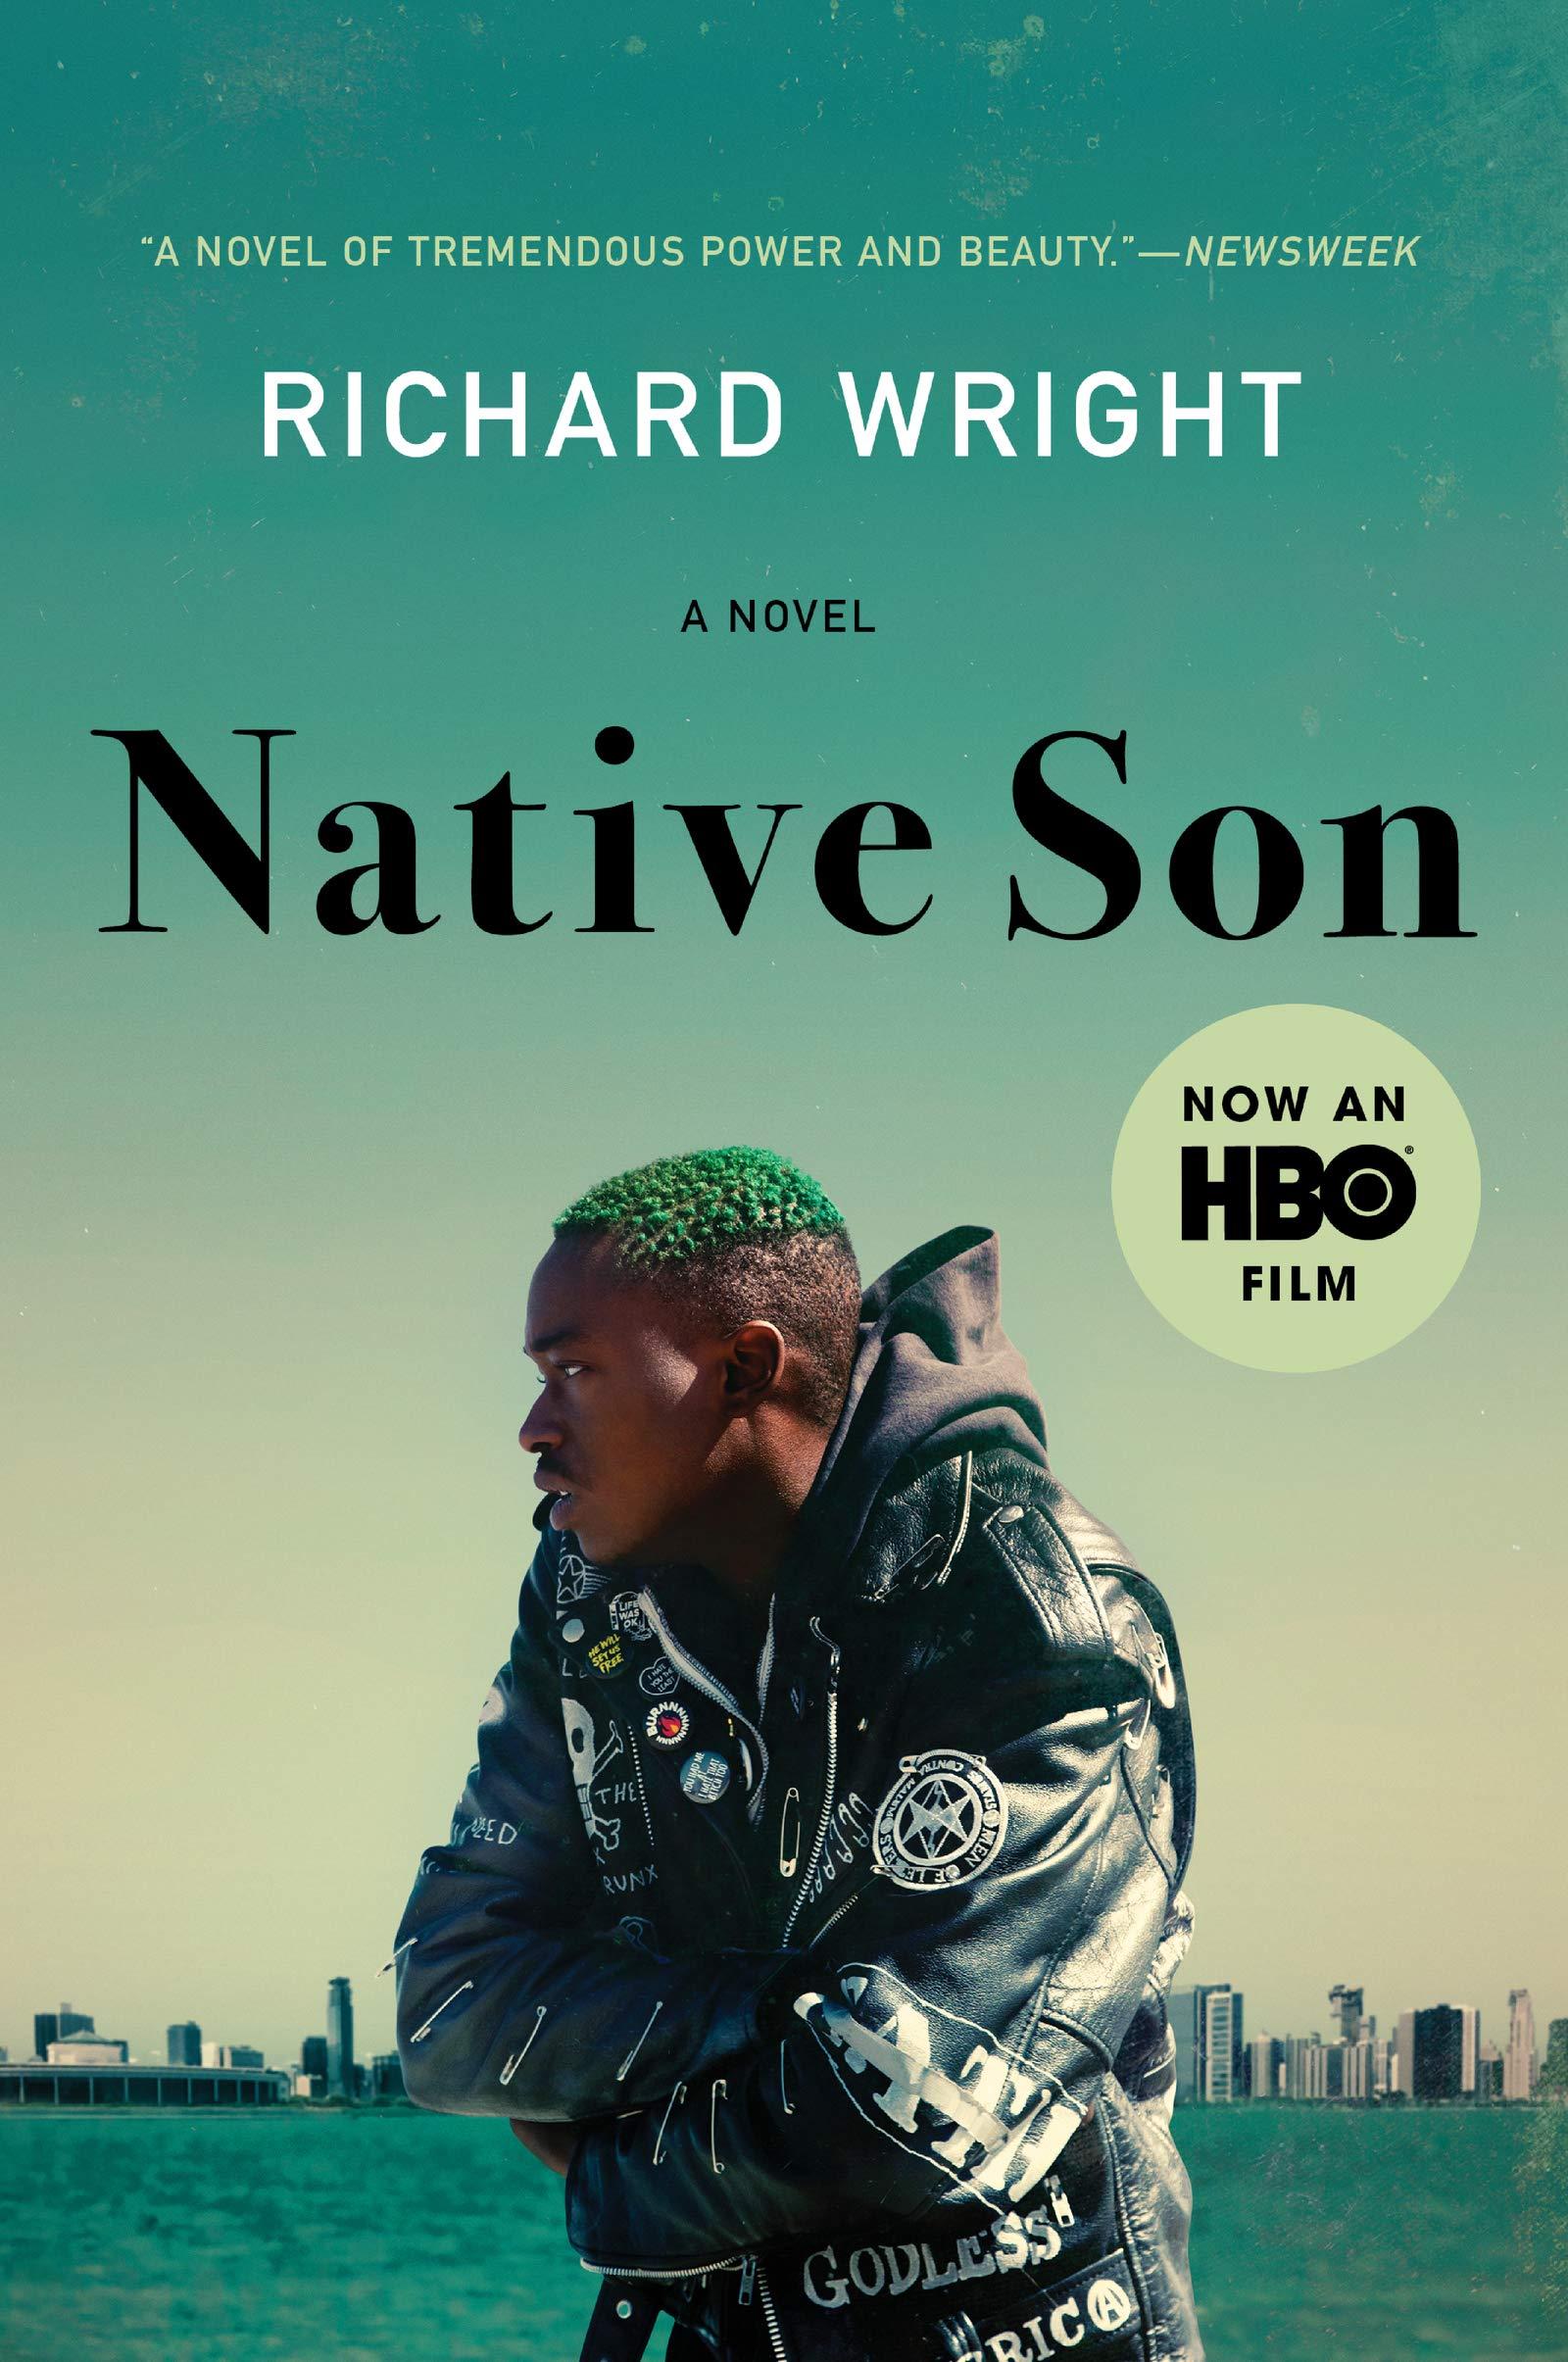 Native Son - Kindle edition by Wright, Richard. Literature & Fiction Kindle  eBooks @ Amazon.com.